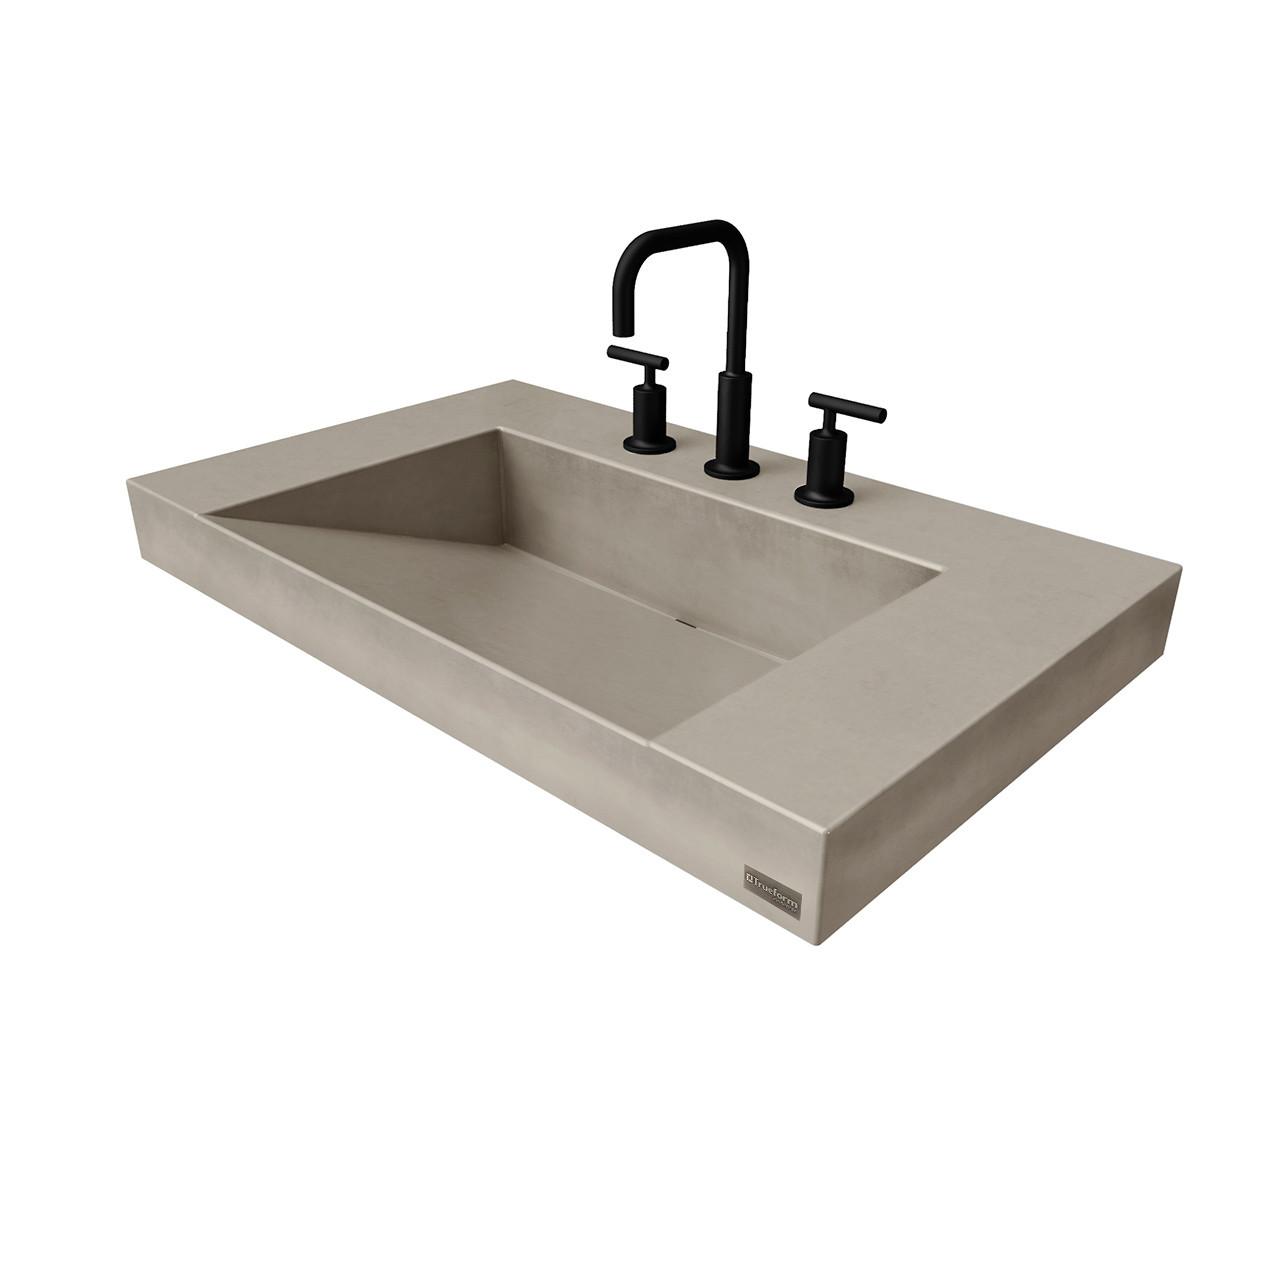 Floating Ada Compliant Bathroom Sink Trueform Concrete